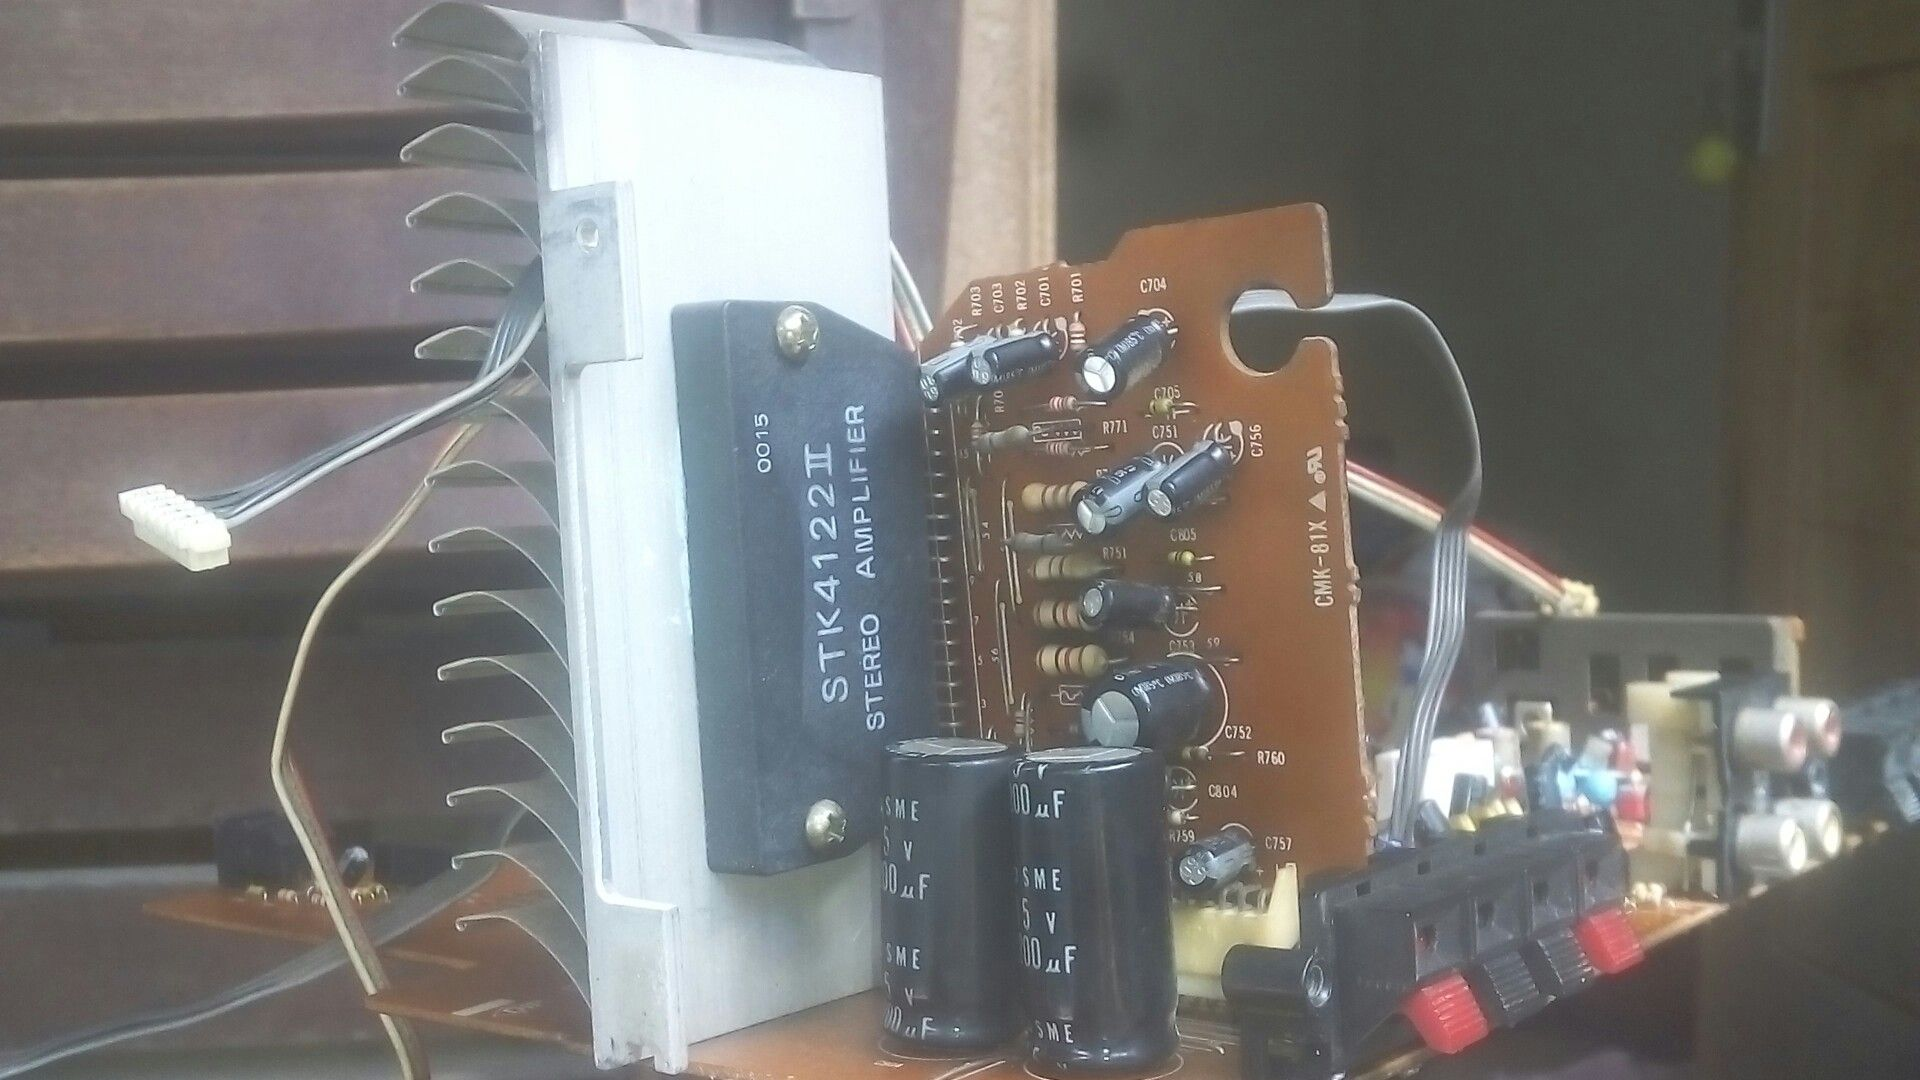 Stk4122 Markii Power Amp Stereo 2 X 15 Rms Diy Boombox Pinterest Wiring Diagram Audio